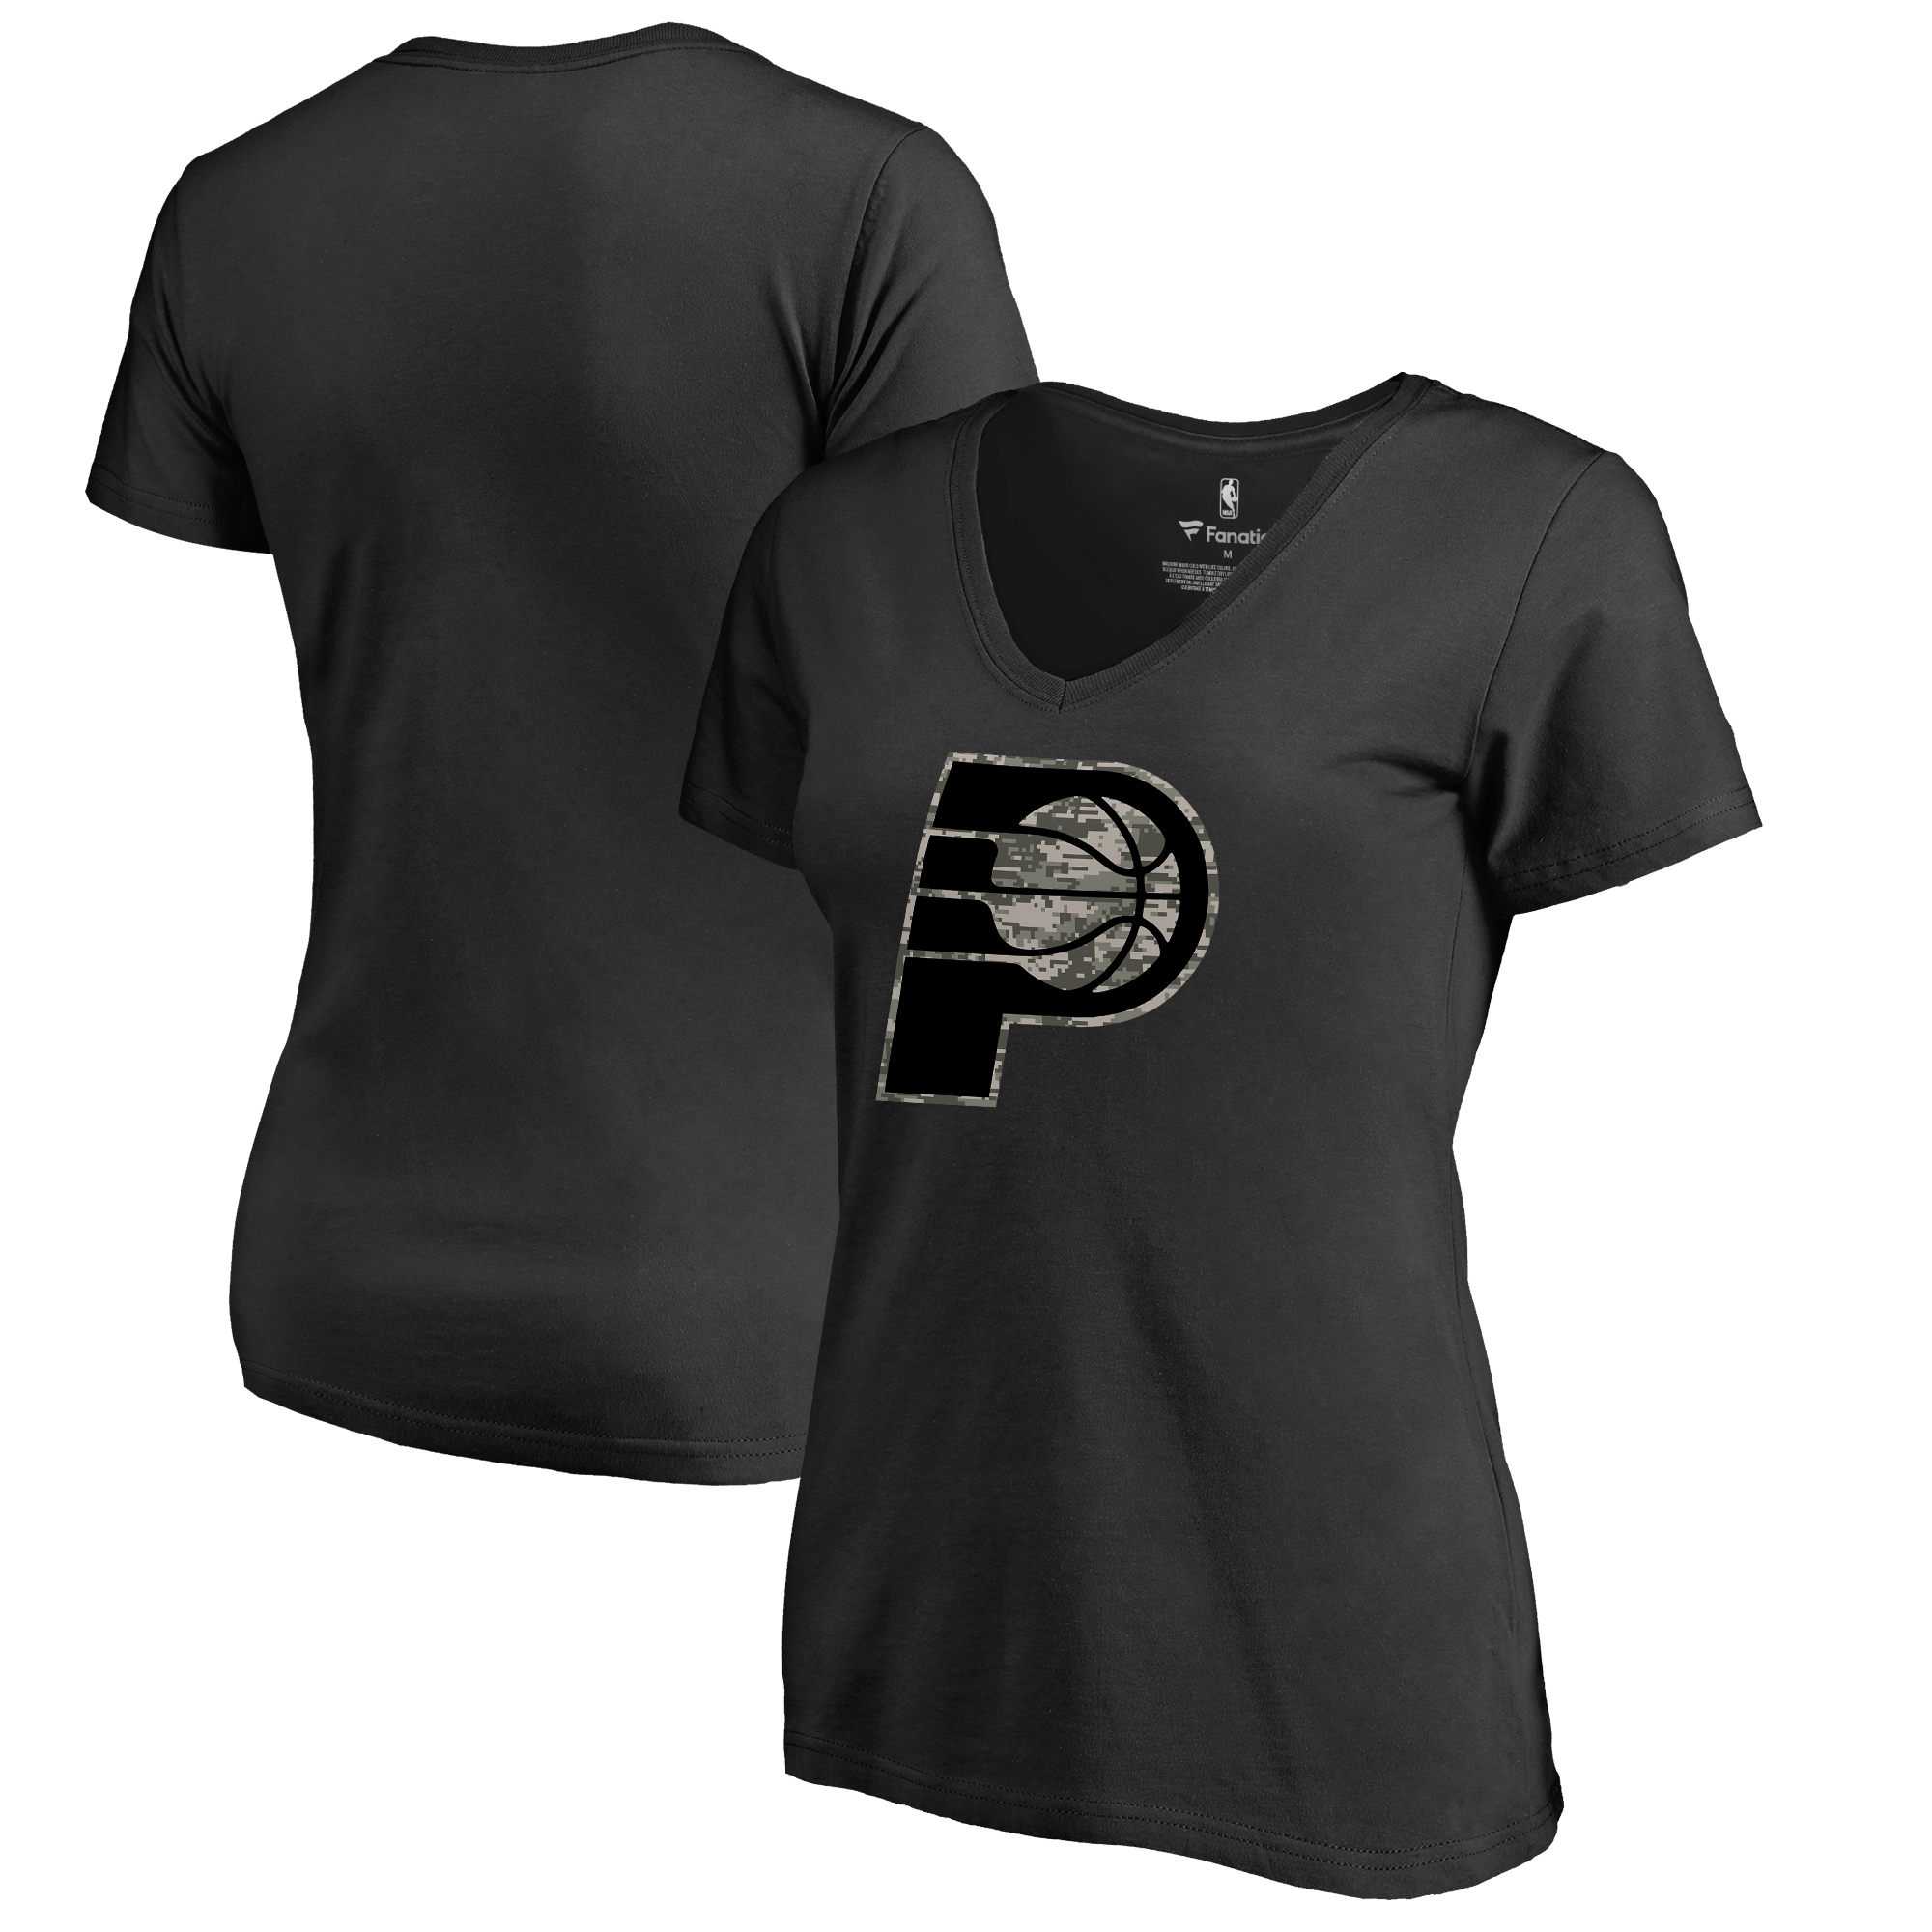 Indiana Pacers Fanatics Branded Women's Plus Size Cloak Camo V-Neck T-Shirt - Black